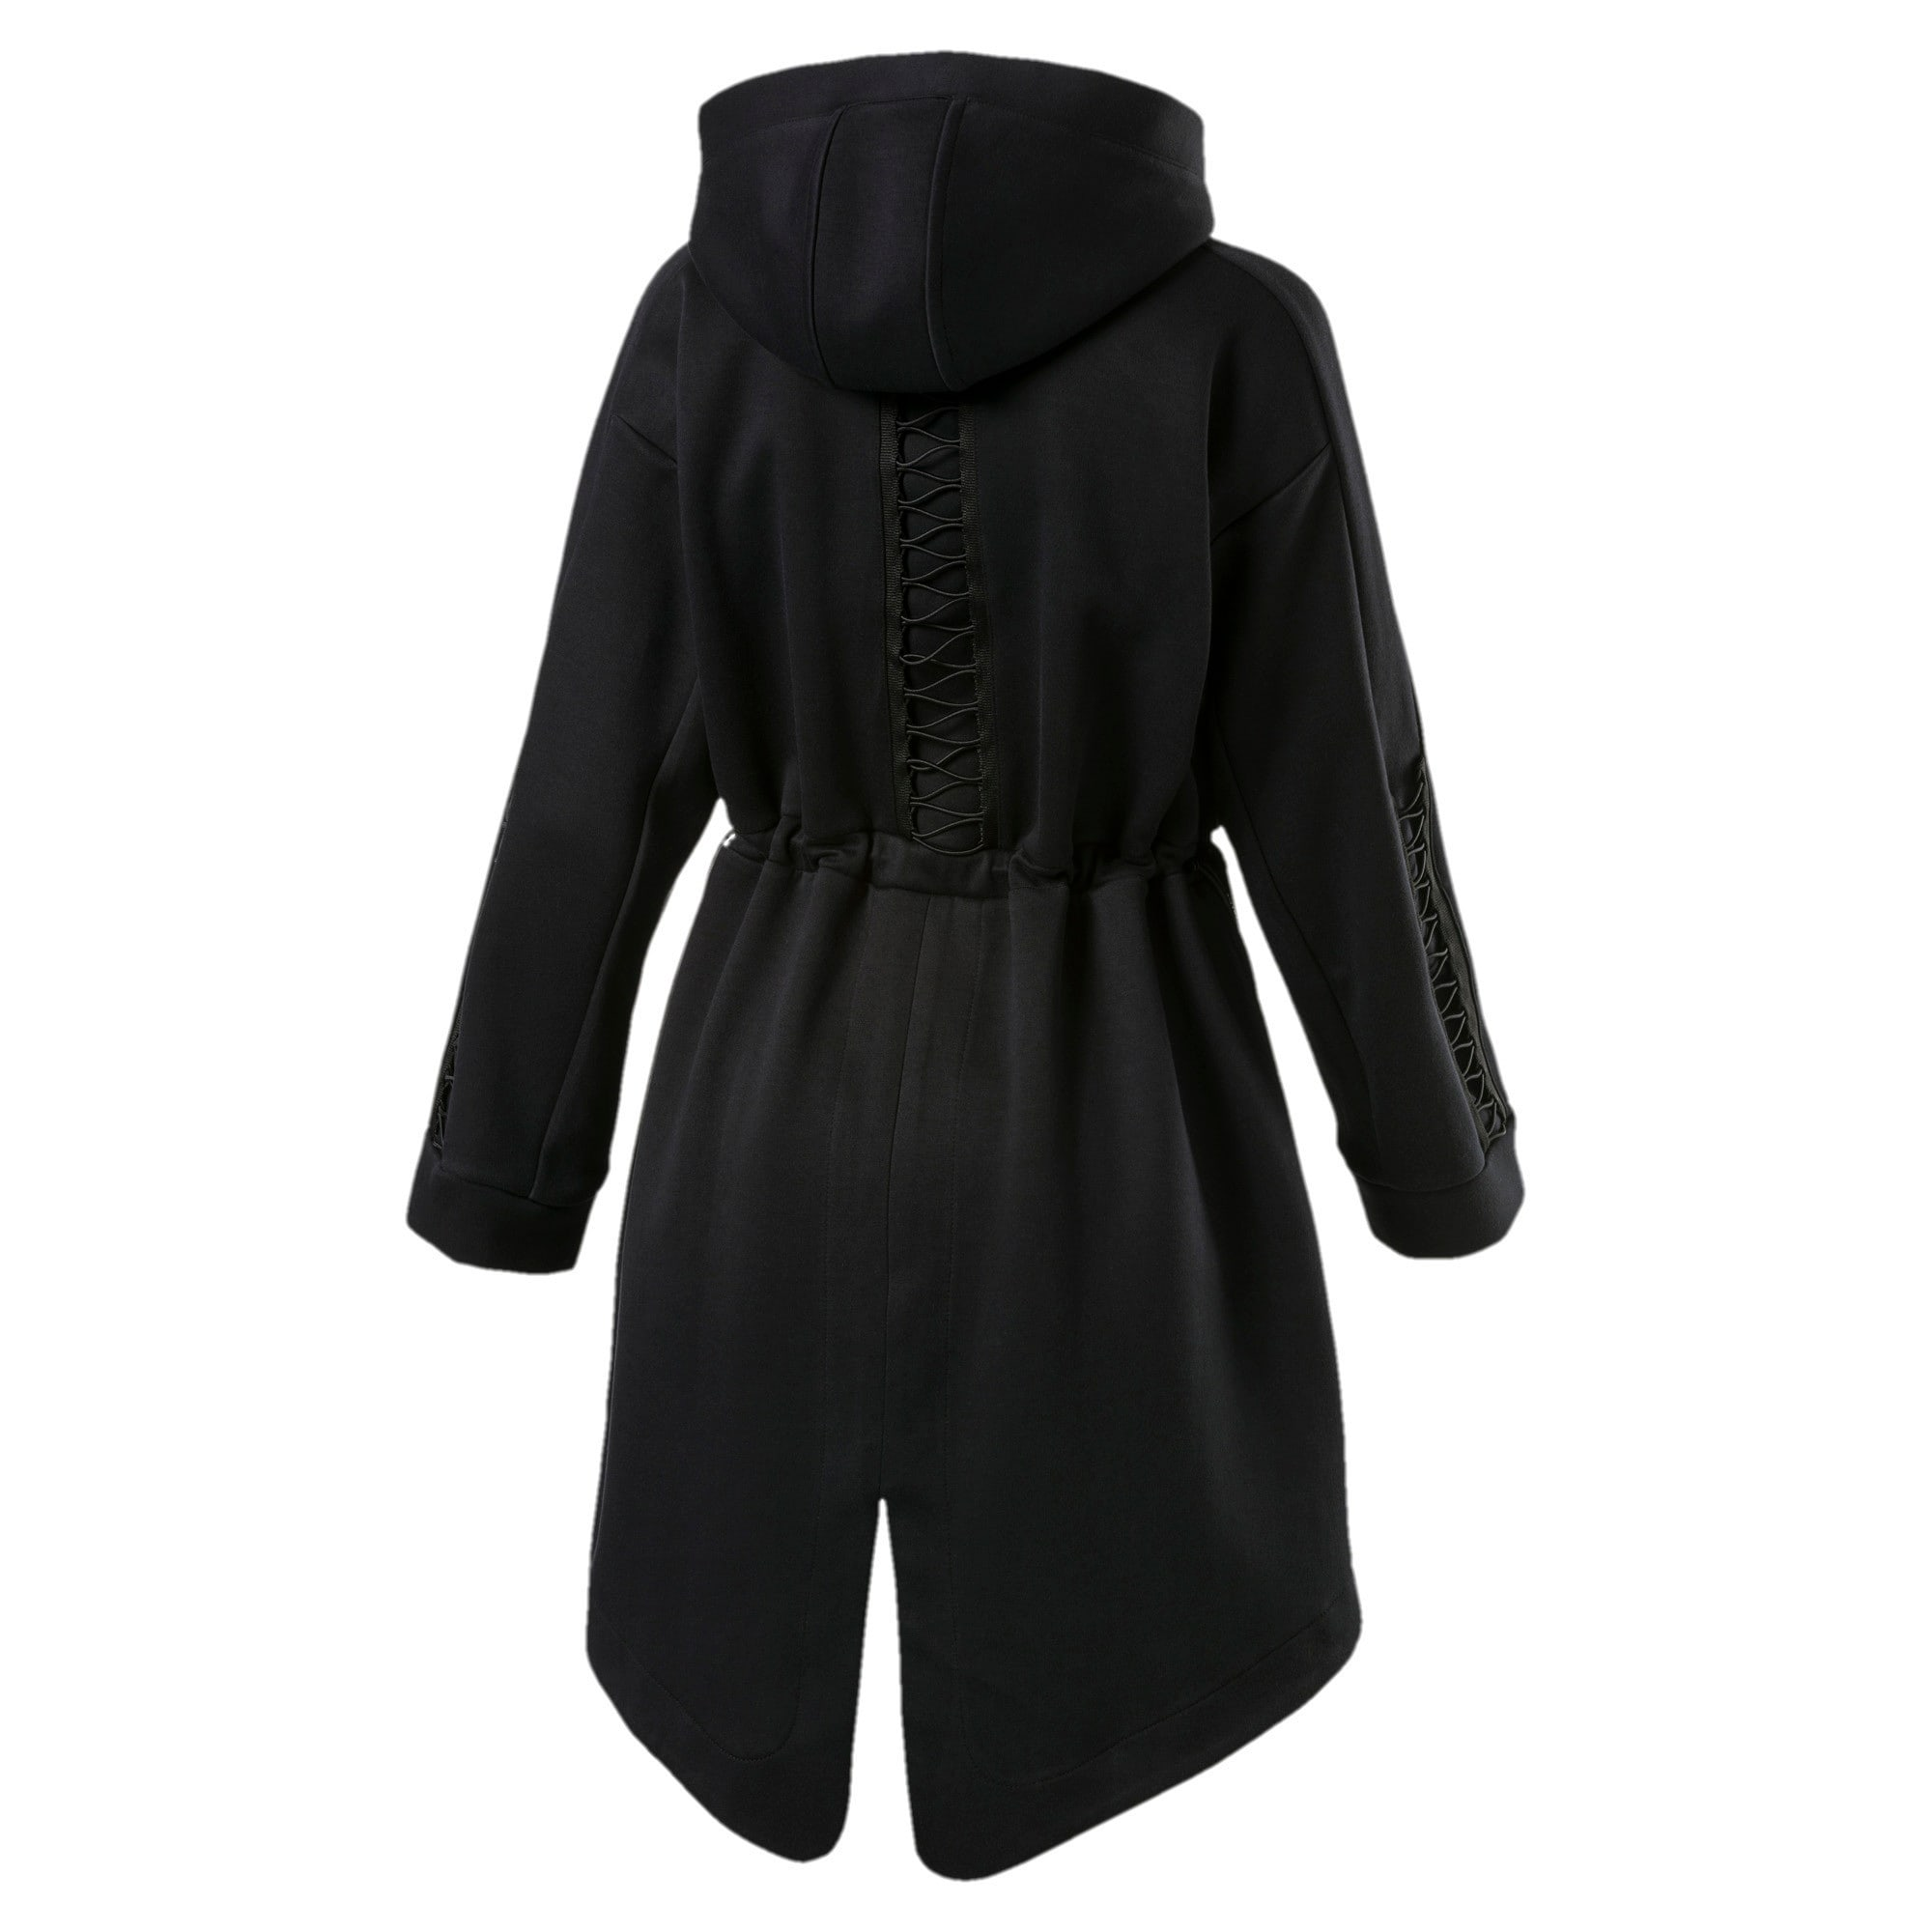 Thumbnail 5 of Evolution Women's Lacing Midlayer Jacket, Puma Black, medium-IND